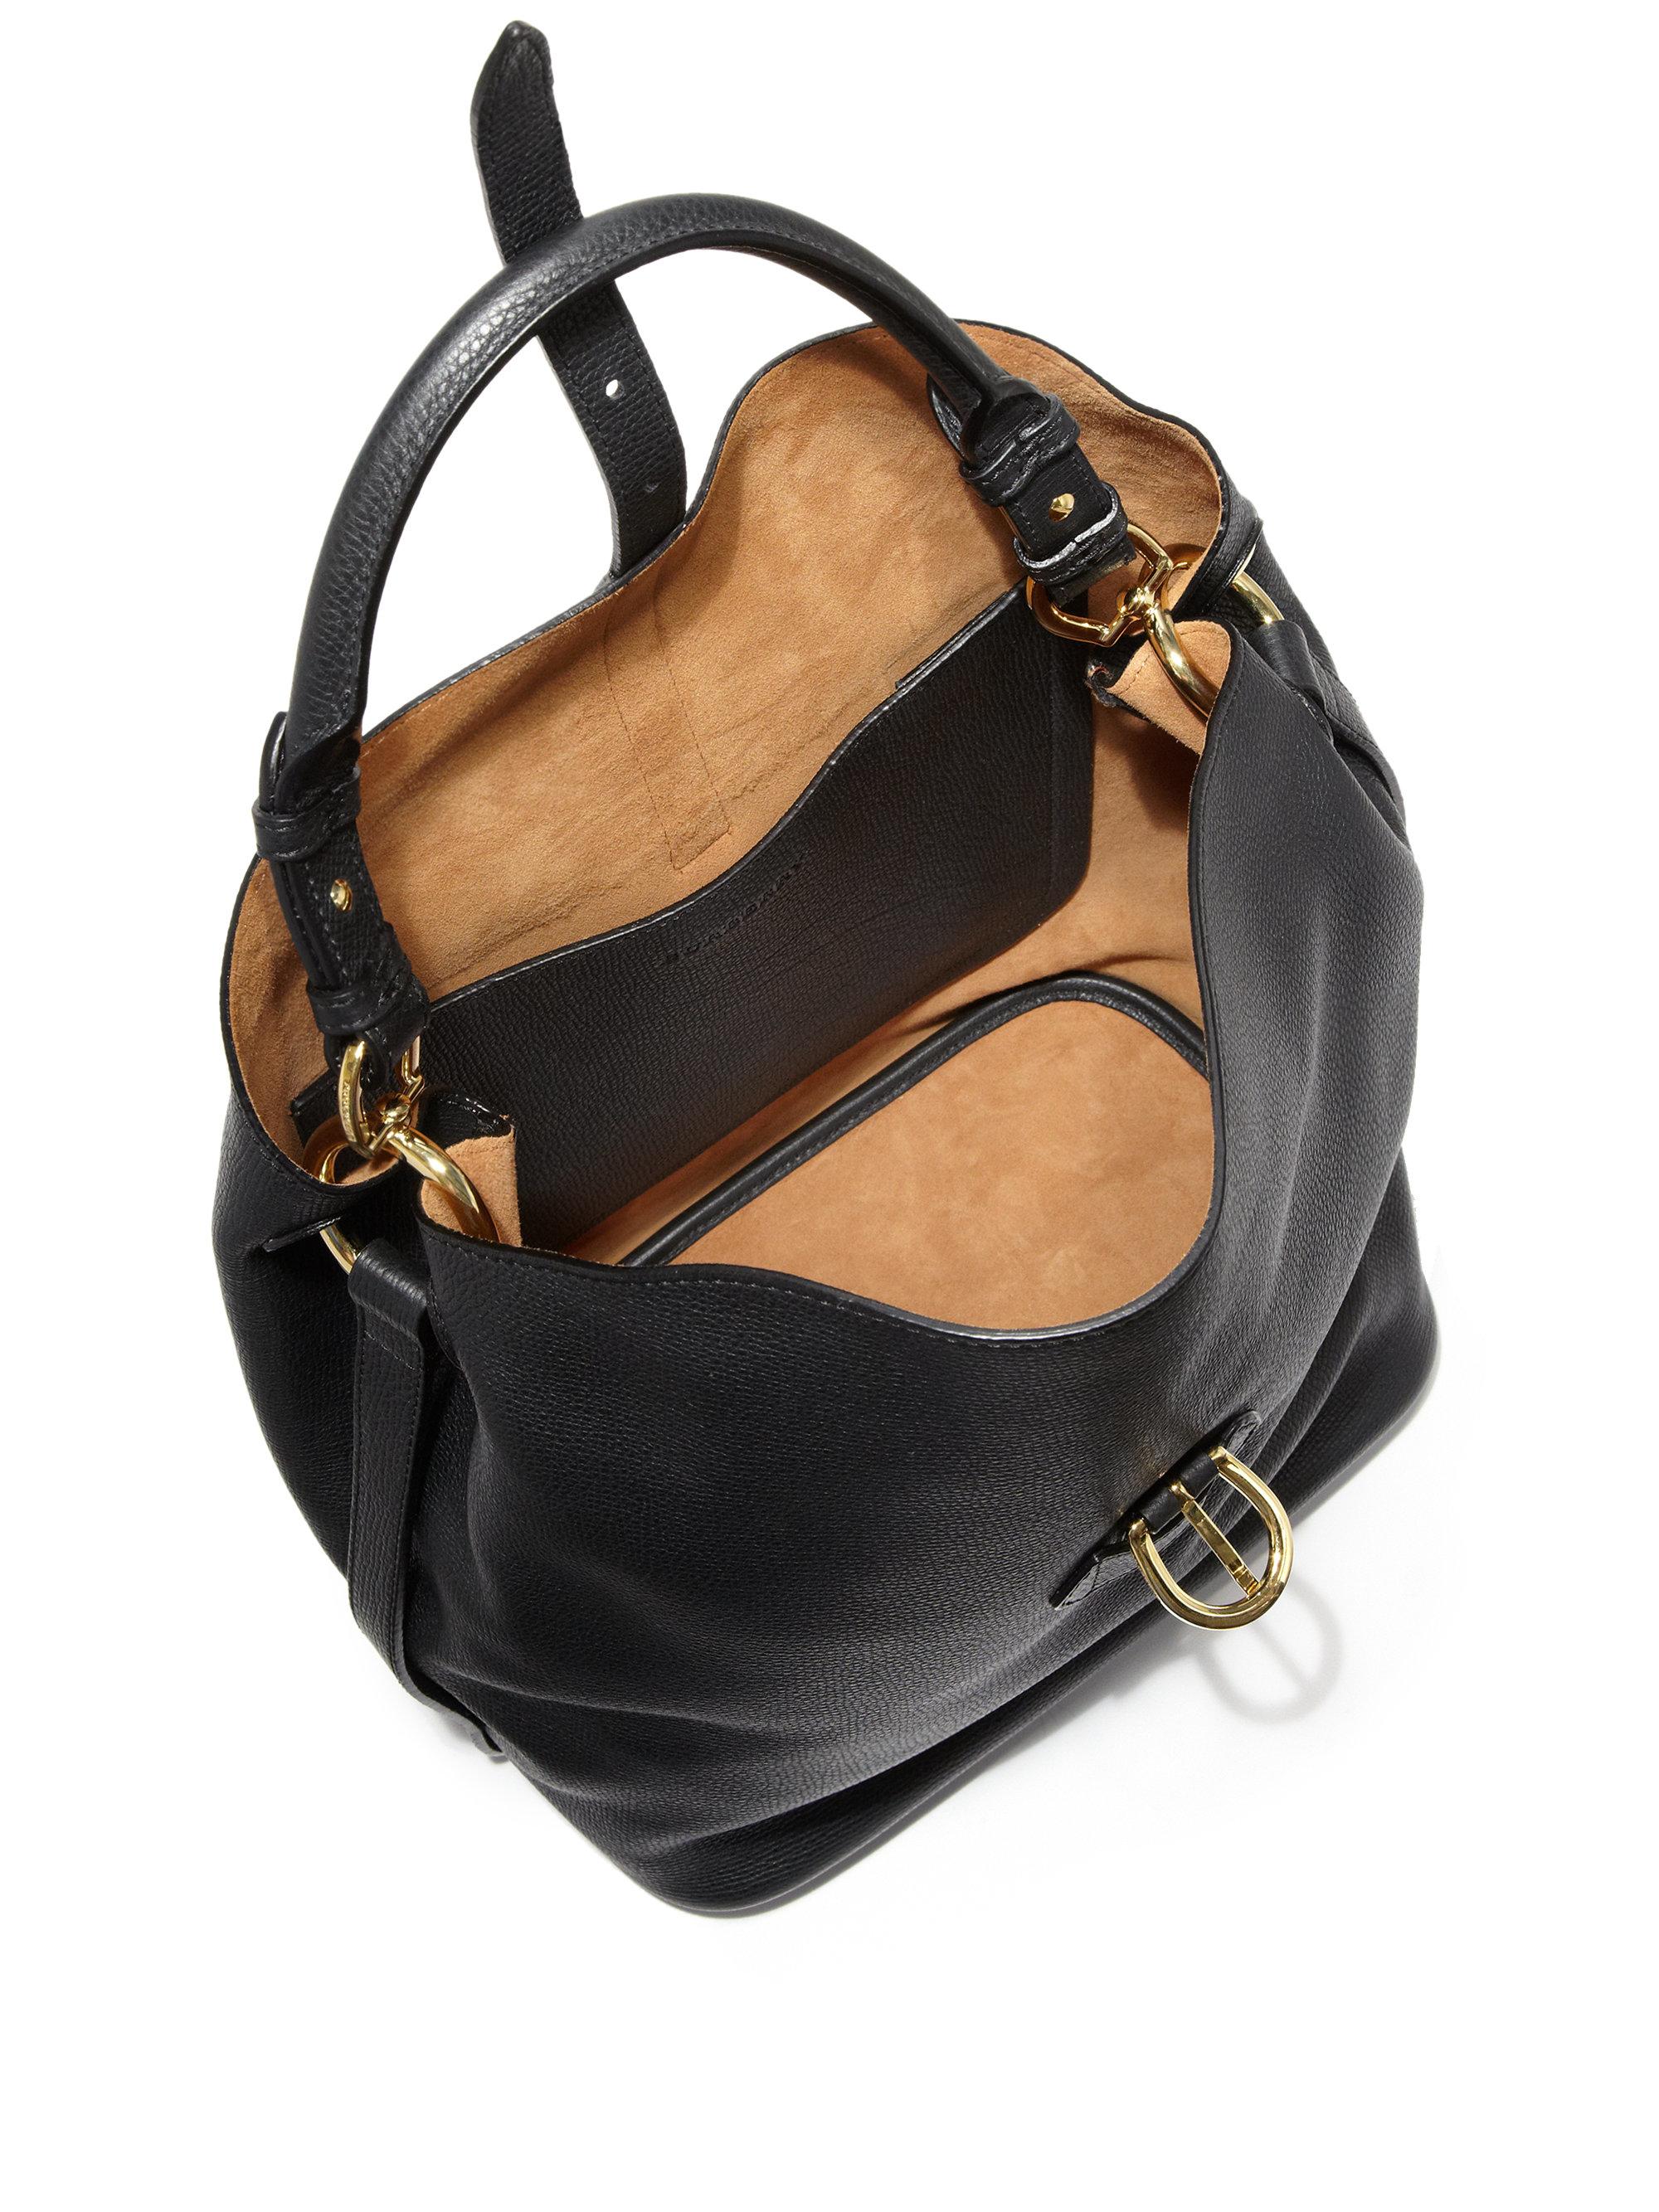 3035187453a Burberry Hobo Handbags - Image Of Handbags Imageorp.co